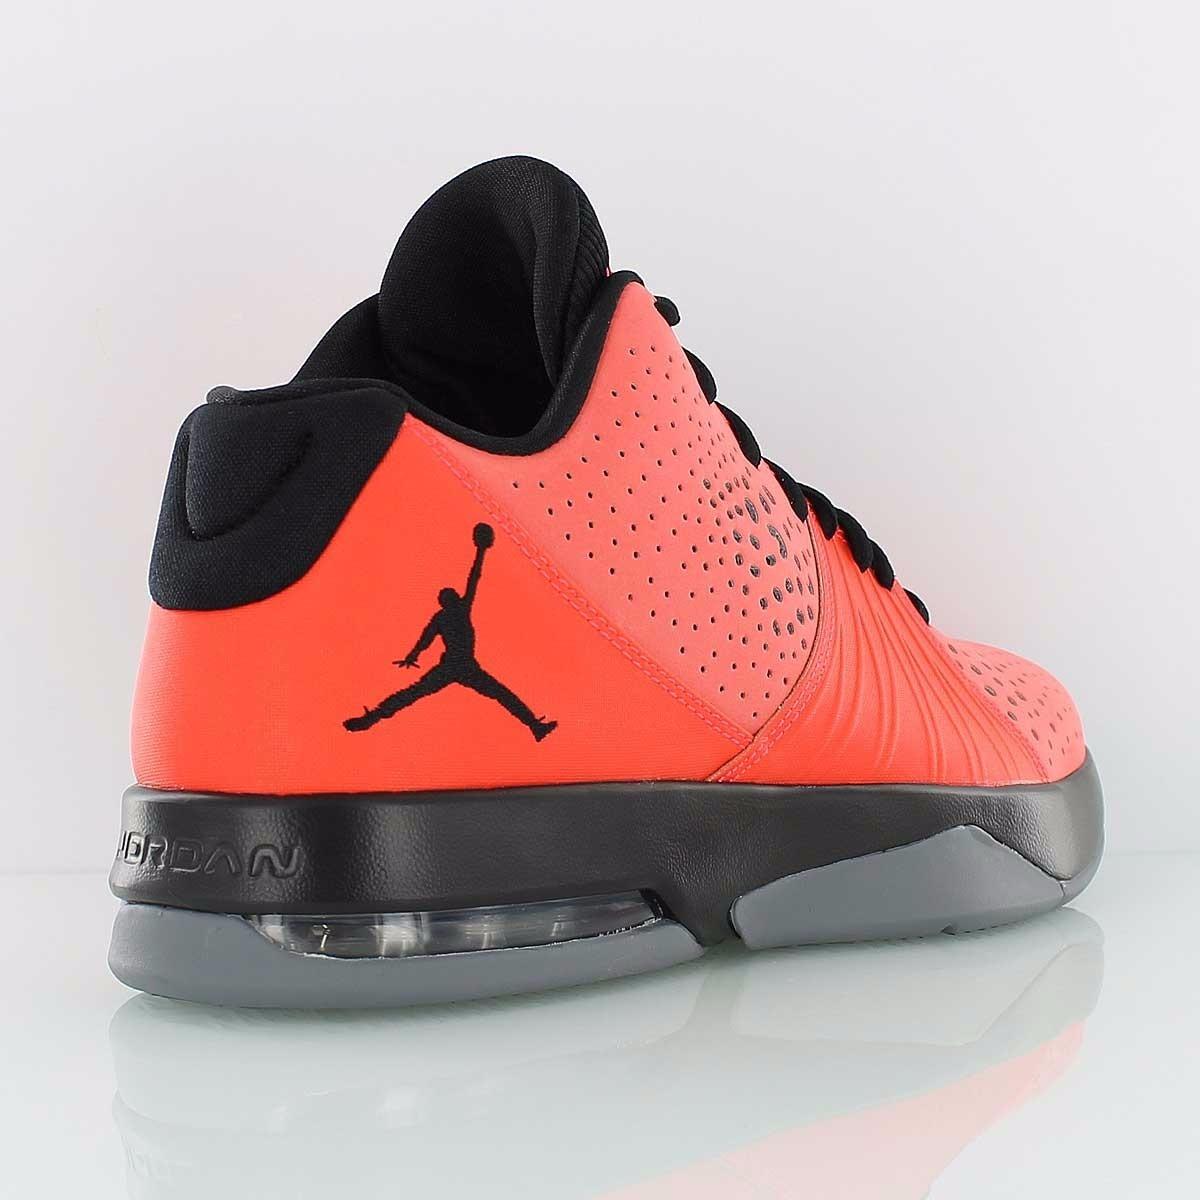 Hombre 2016 Jordan Shwxtq Zapatos Ver Para At 1zPnPtxOw